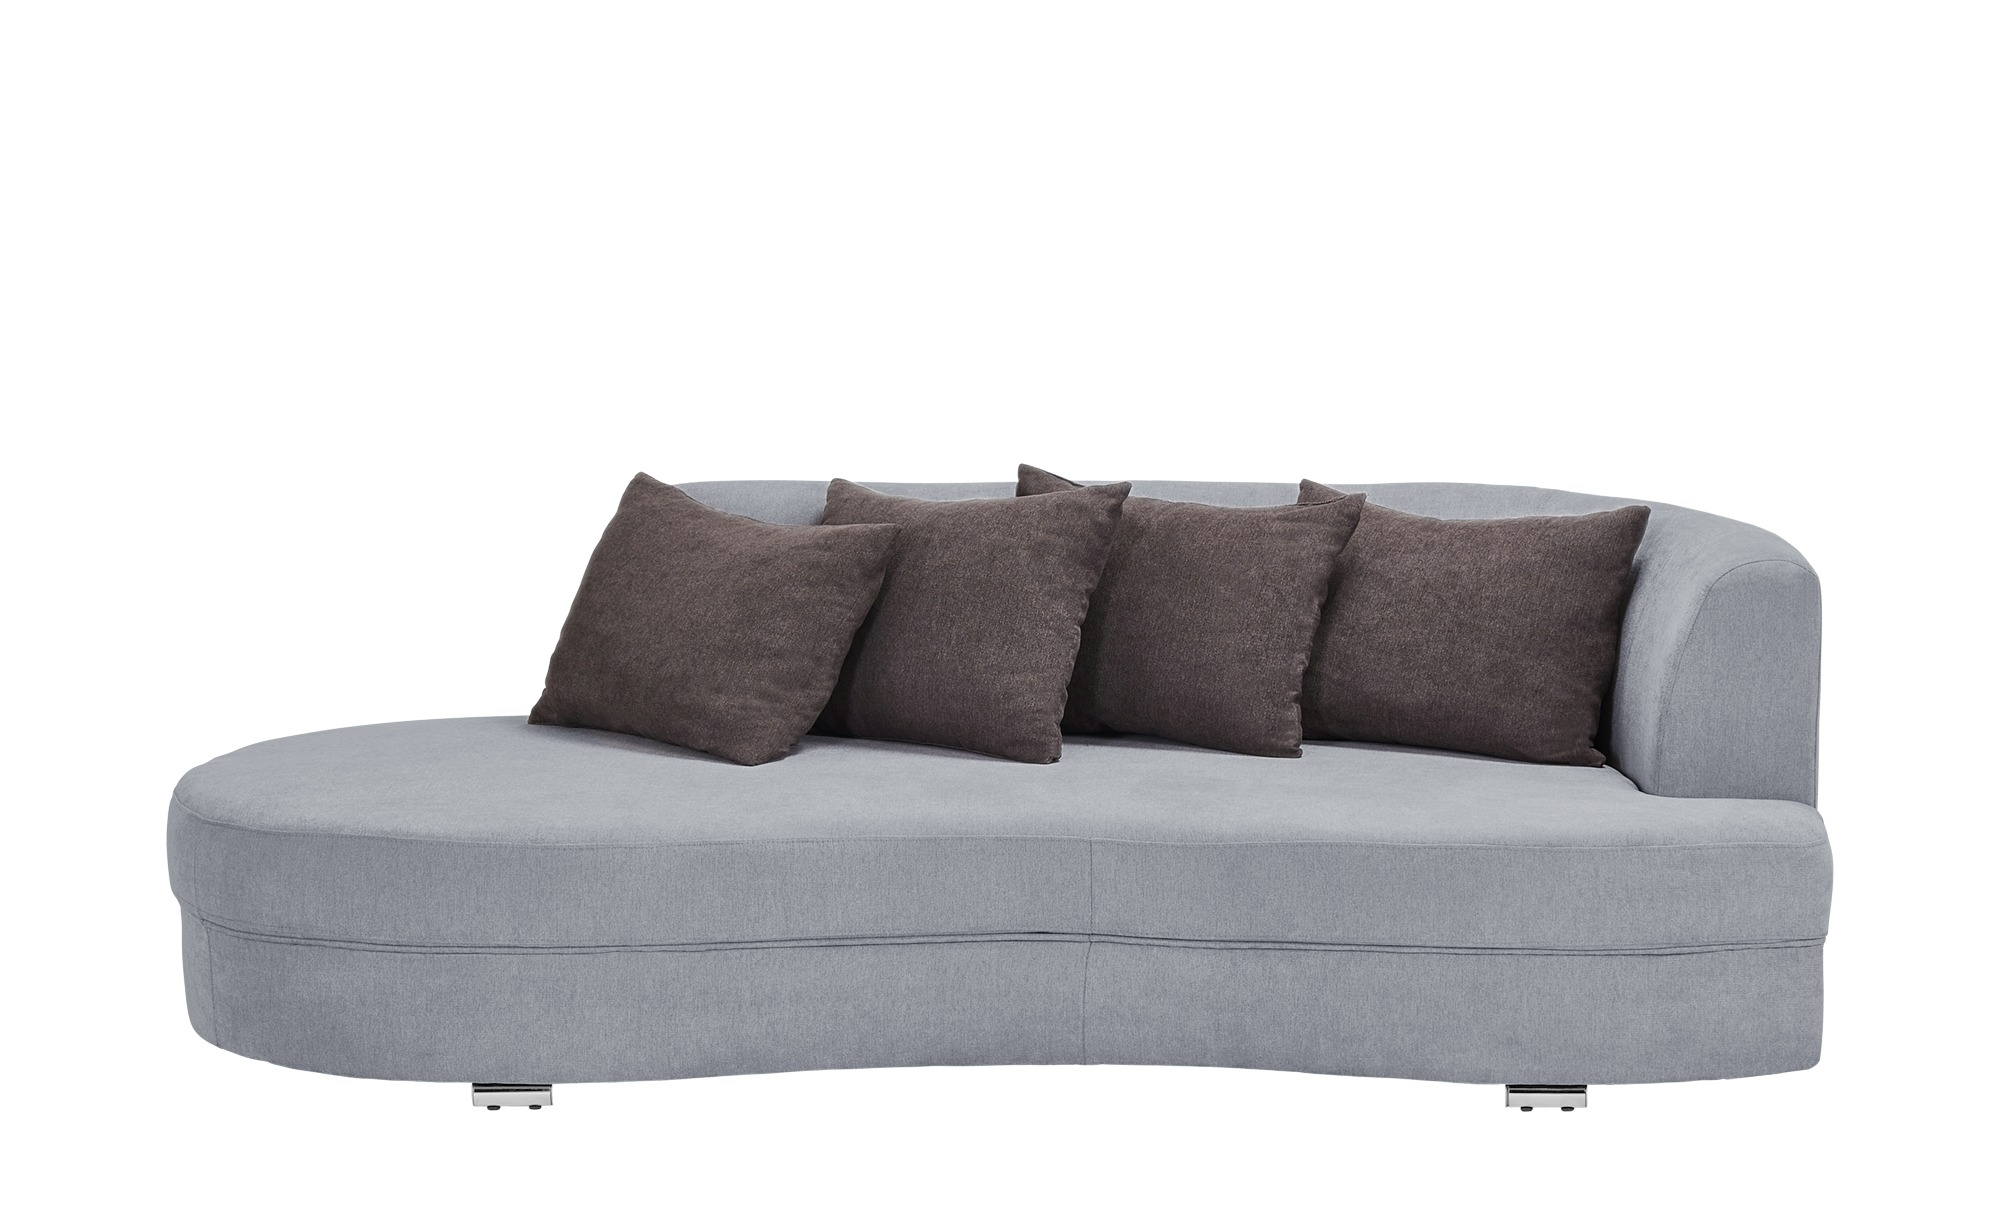 Full Size of Smart Big Sofa Grau Flachgewebe Marina Silbergrau Wohnlandschaft Chippendale Mit Hocker Schilling Garnitur Stoff Rundes Antik 3er Federkern Rattan Englisch Sofa Höffner Big Sofa